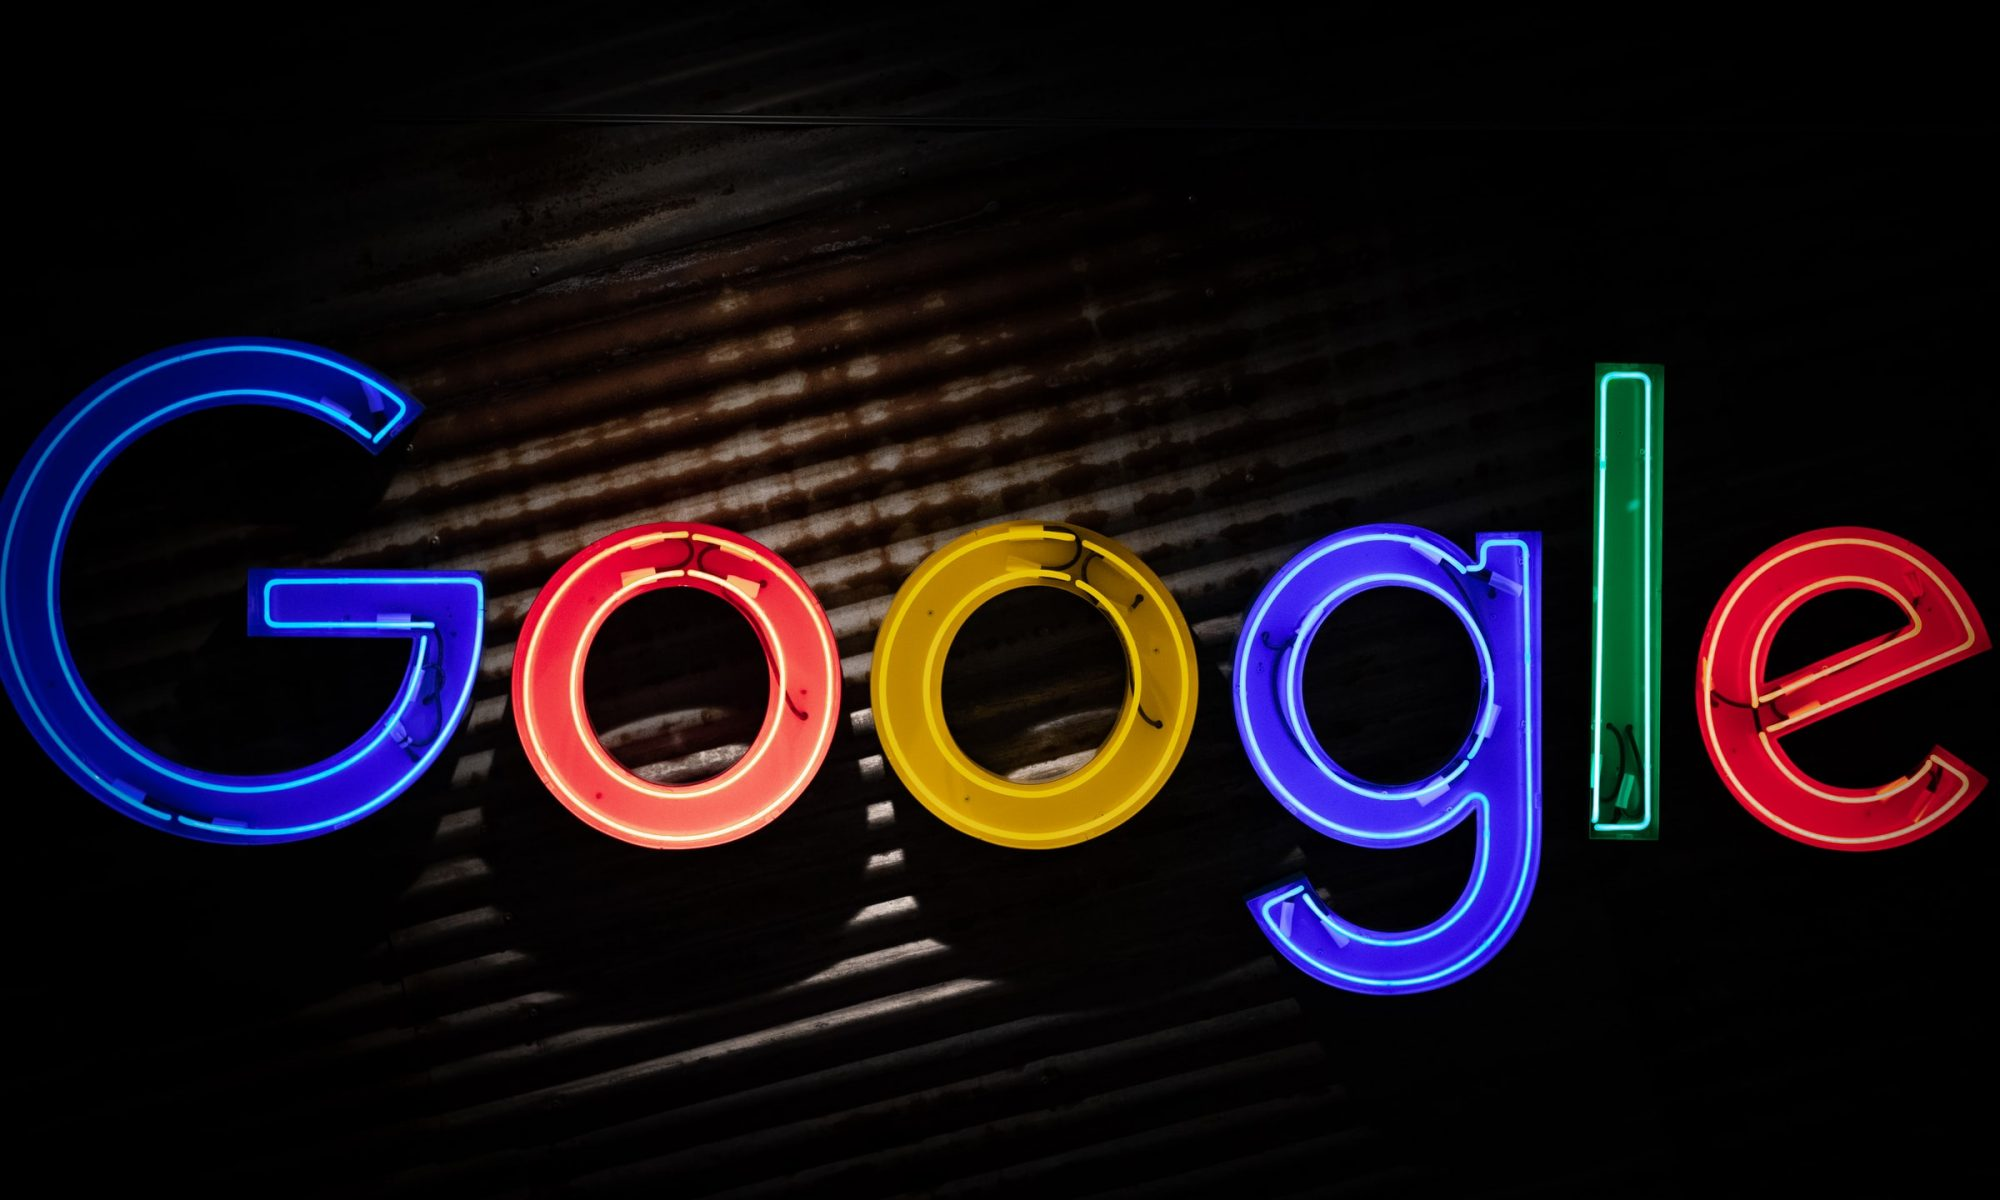 seo-referencement-google-images-recherche-mes-photos-photographe-wordpress-alt- alternatif-title-tags-taille-optimisation-poids-comment-balises-meta-attribut-hd-plugin